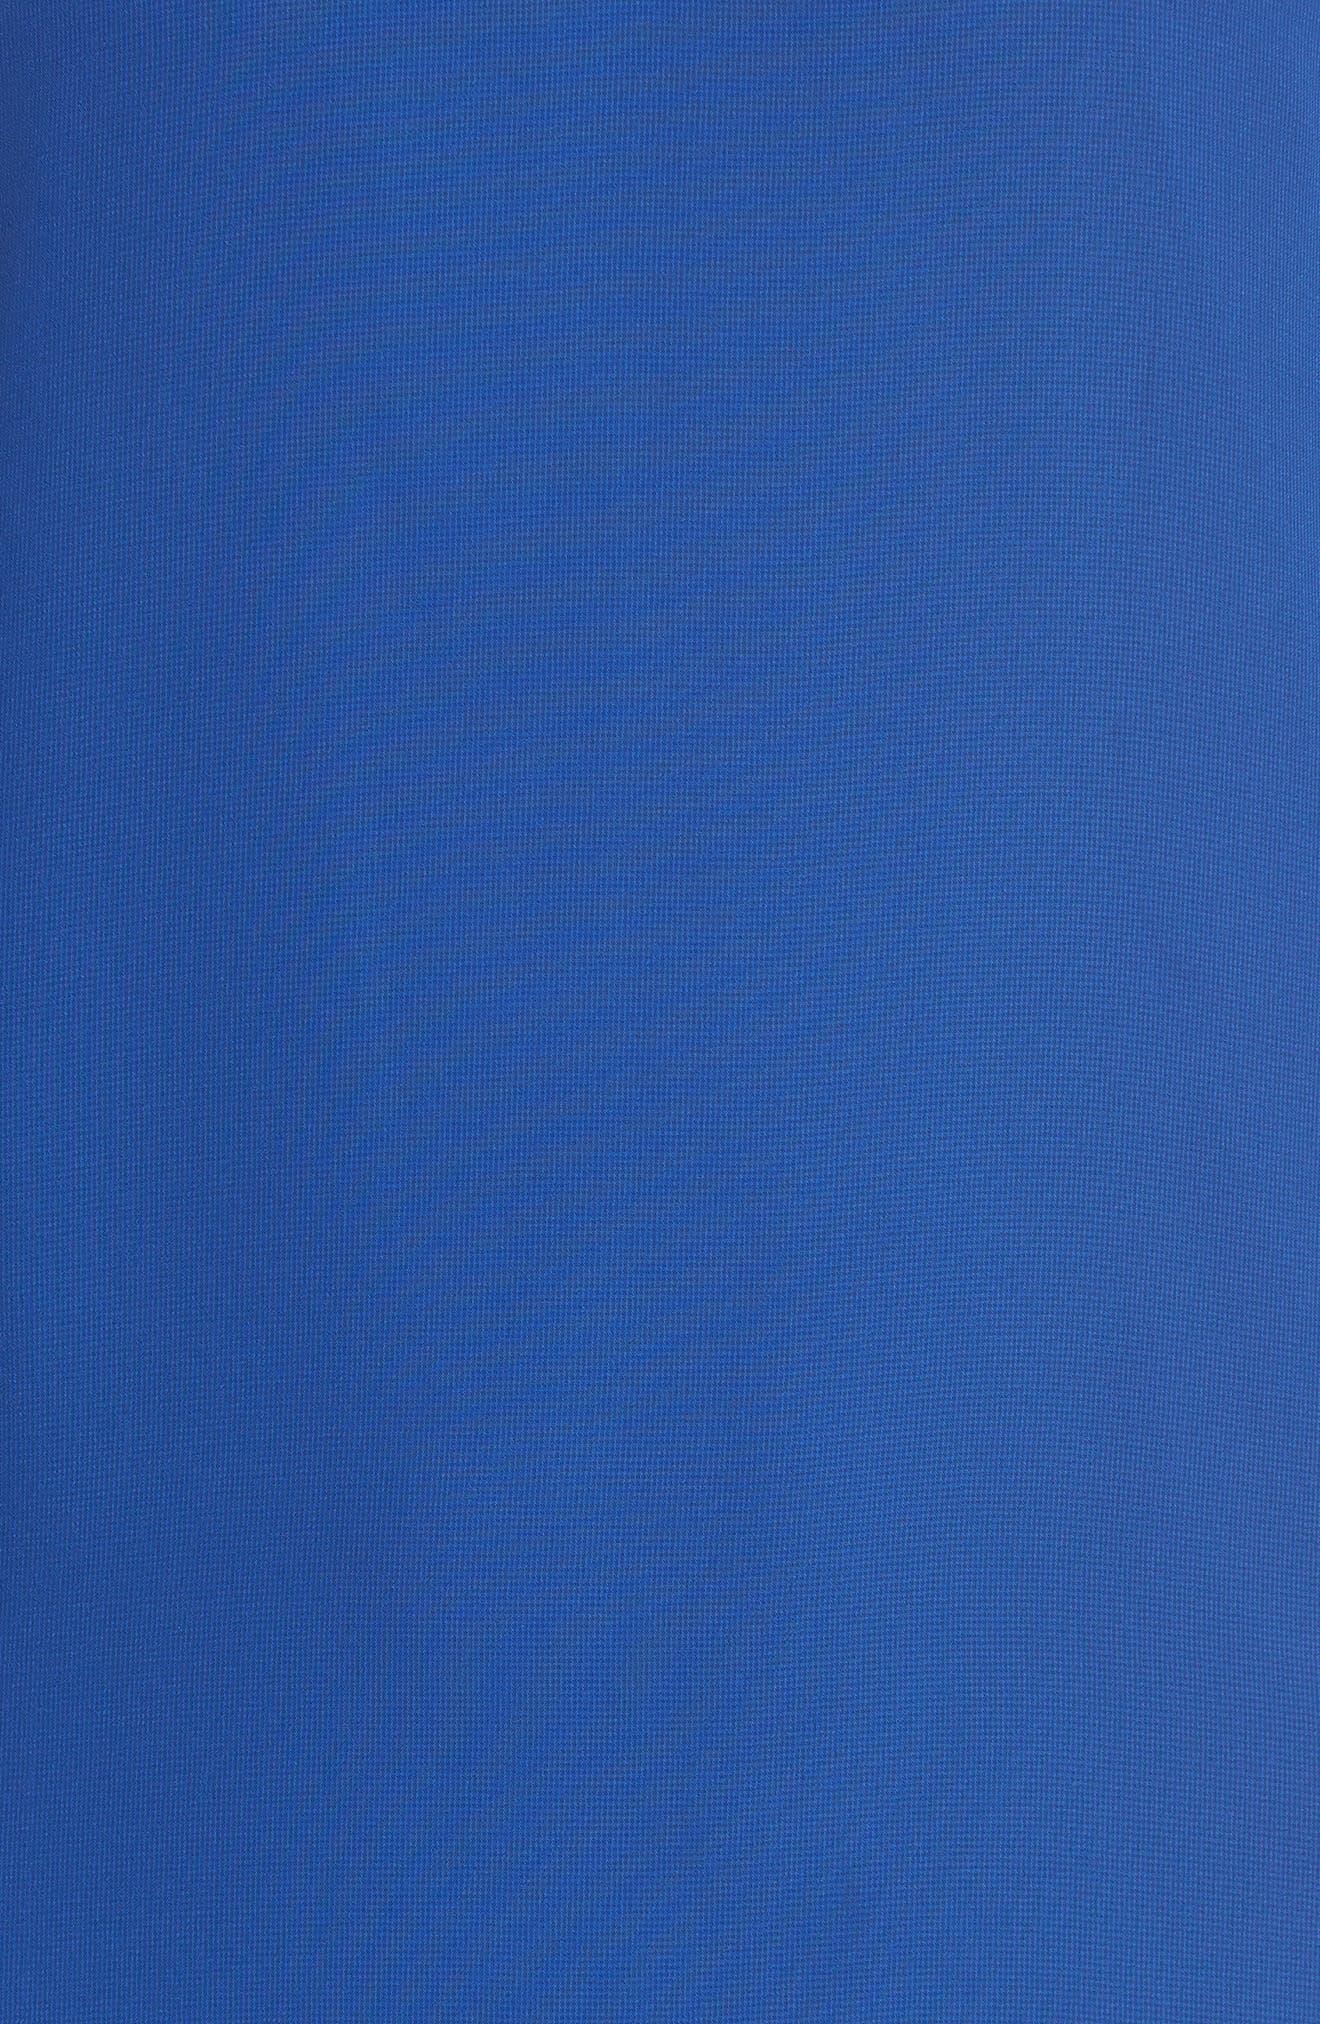 Carmen Tiered Ruffle Sleeve Shift Dress,                             Alternate thumbnail 6, color,                             400